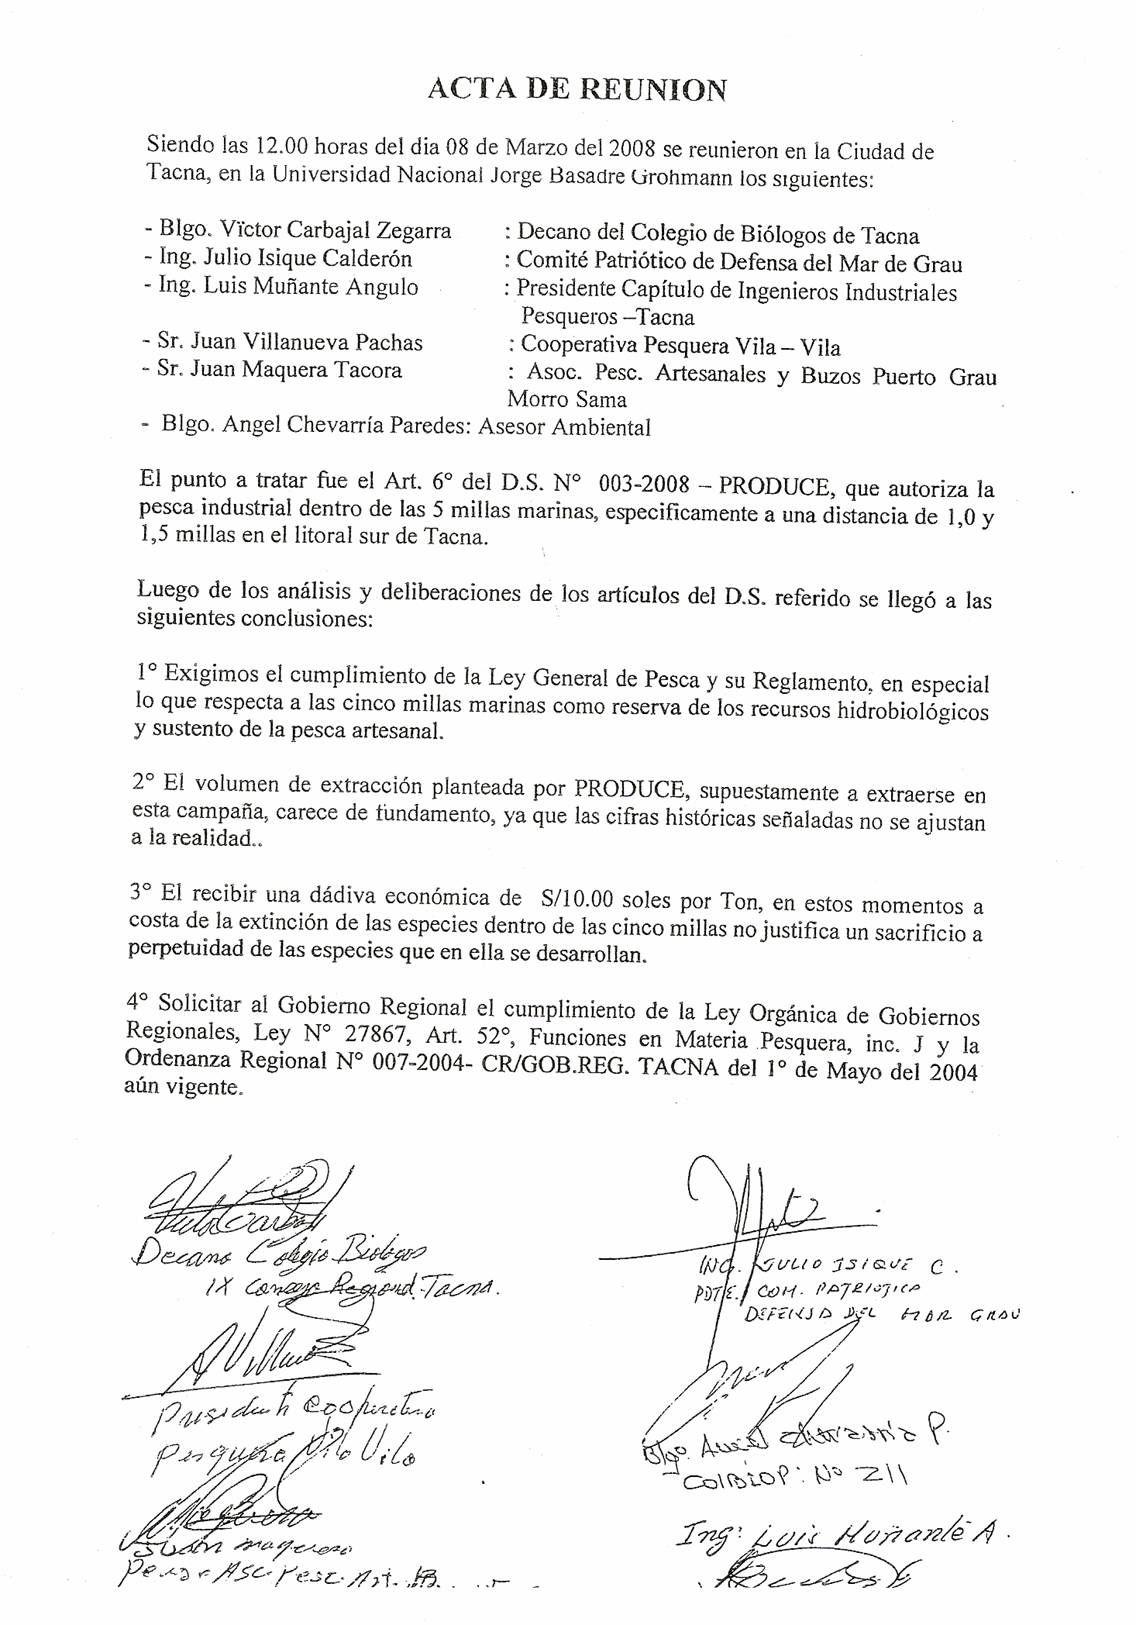 Reuniones Universidad Nacional Jorge Formatos para actas de reuniones